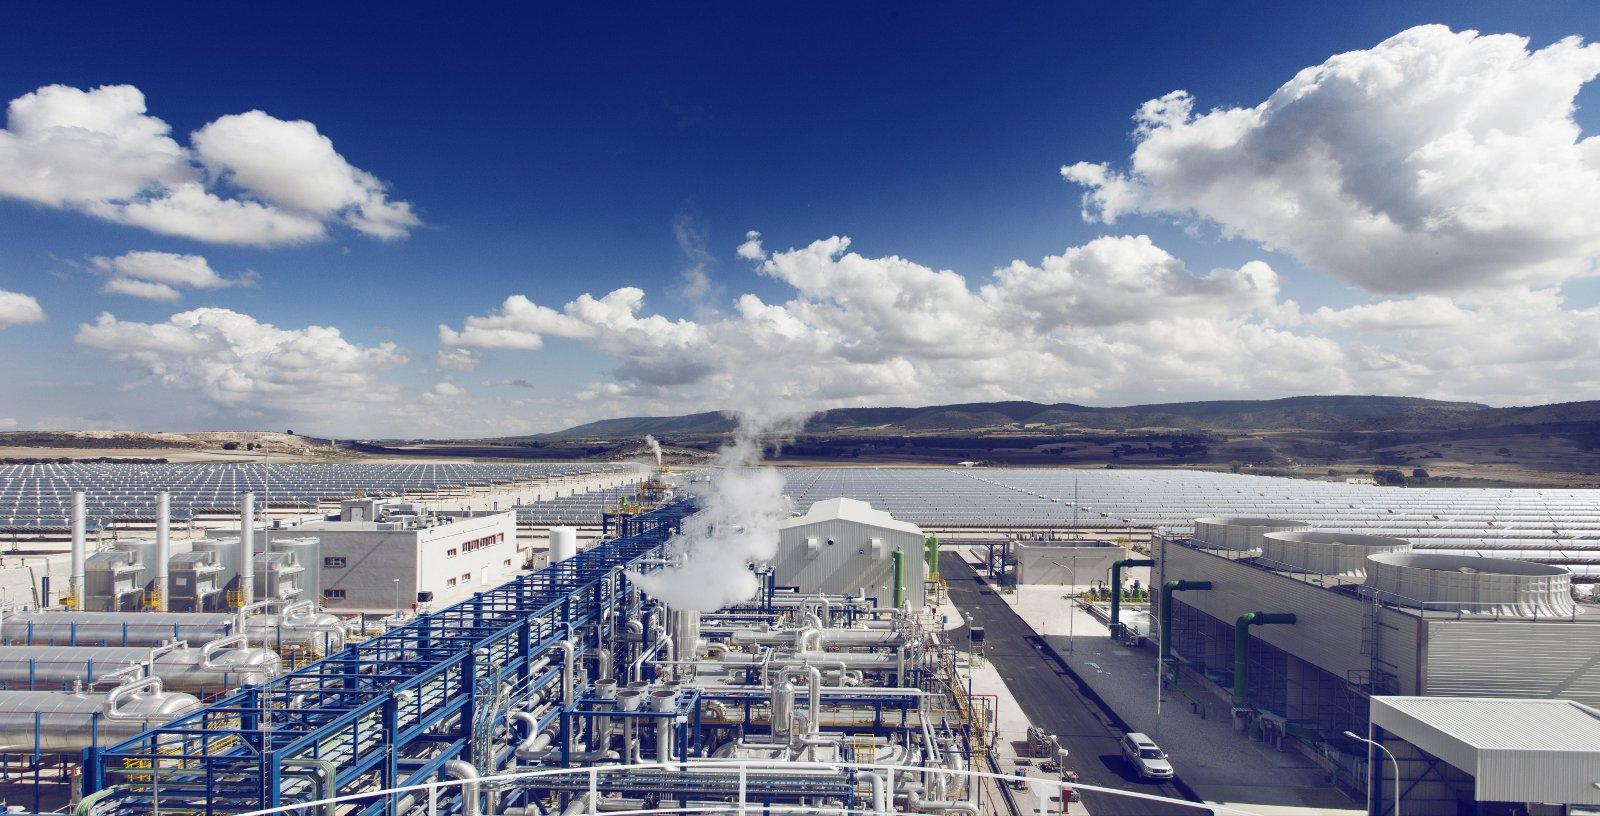 FCC_ENERSTAR_VILLENA_Thermosolar_power_plant_03_Idom